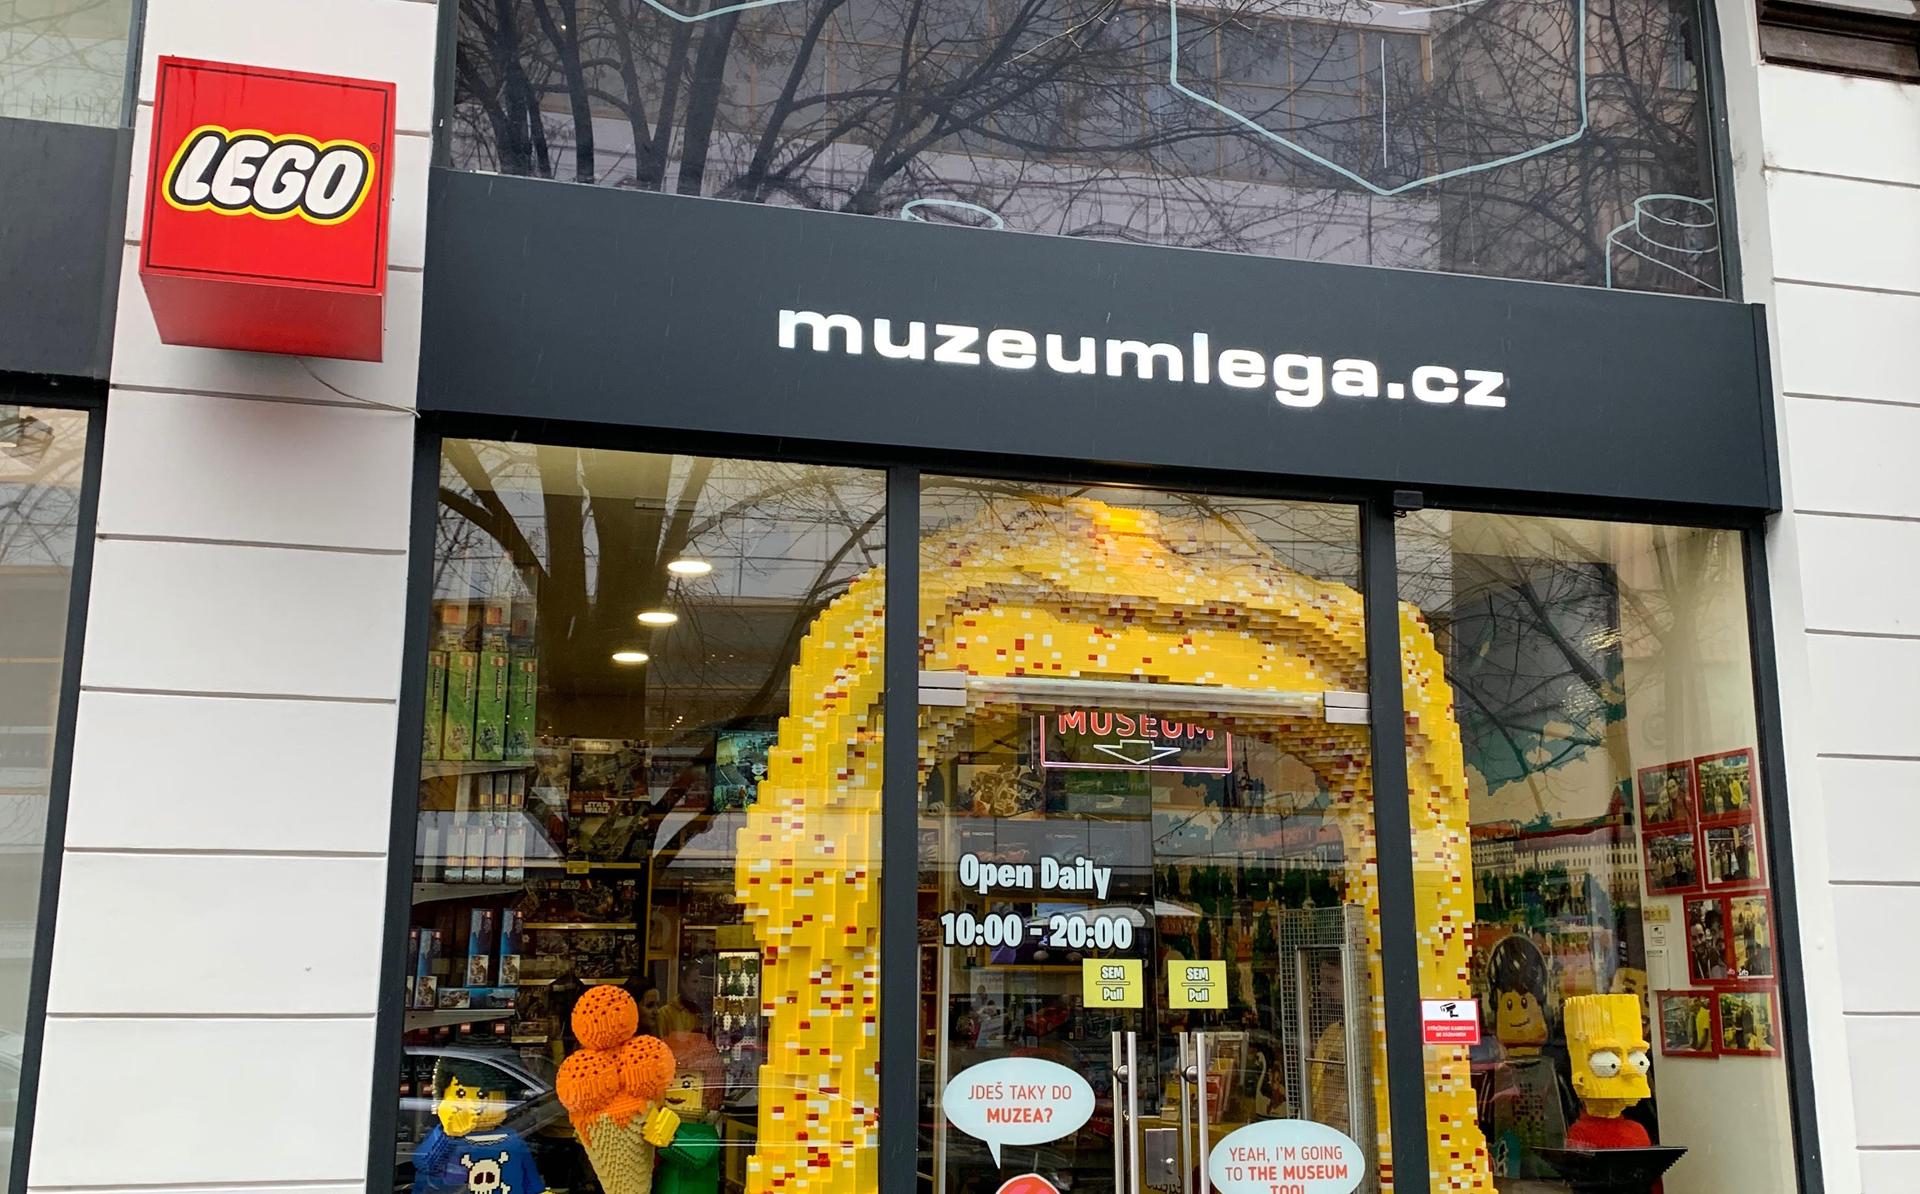 eu Legomuzeum LegaPrague Musée Musée Legomuzeum w8mNn0